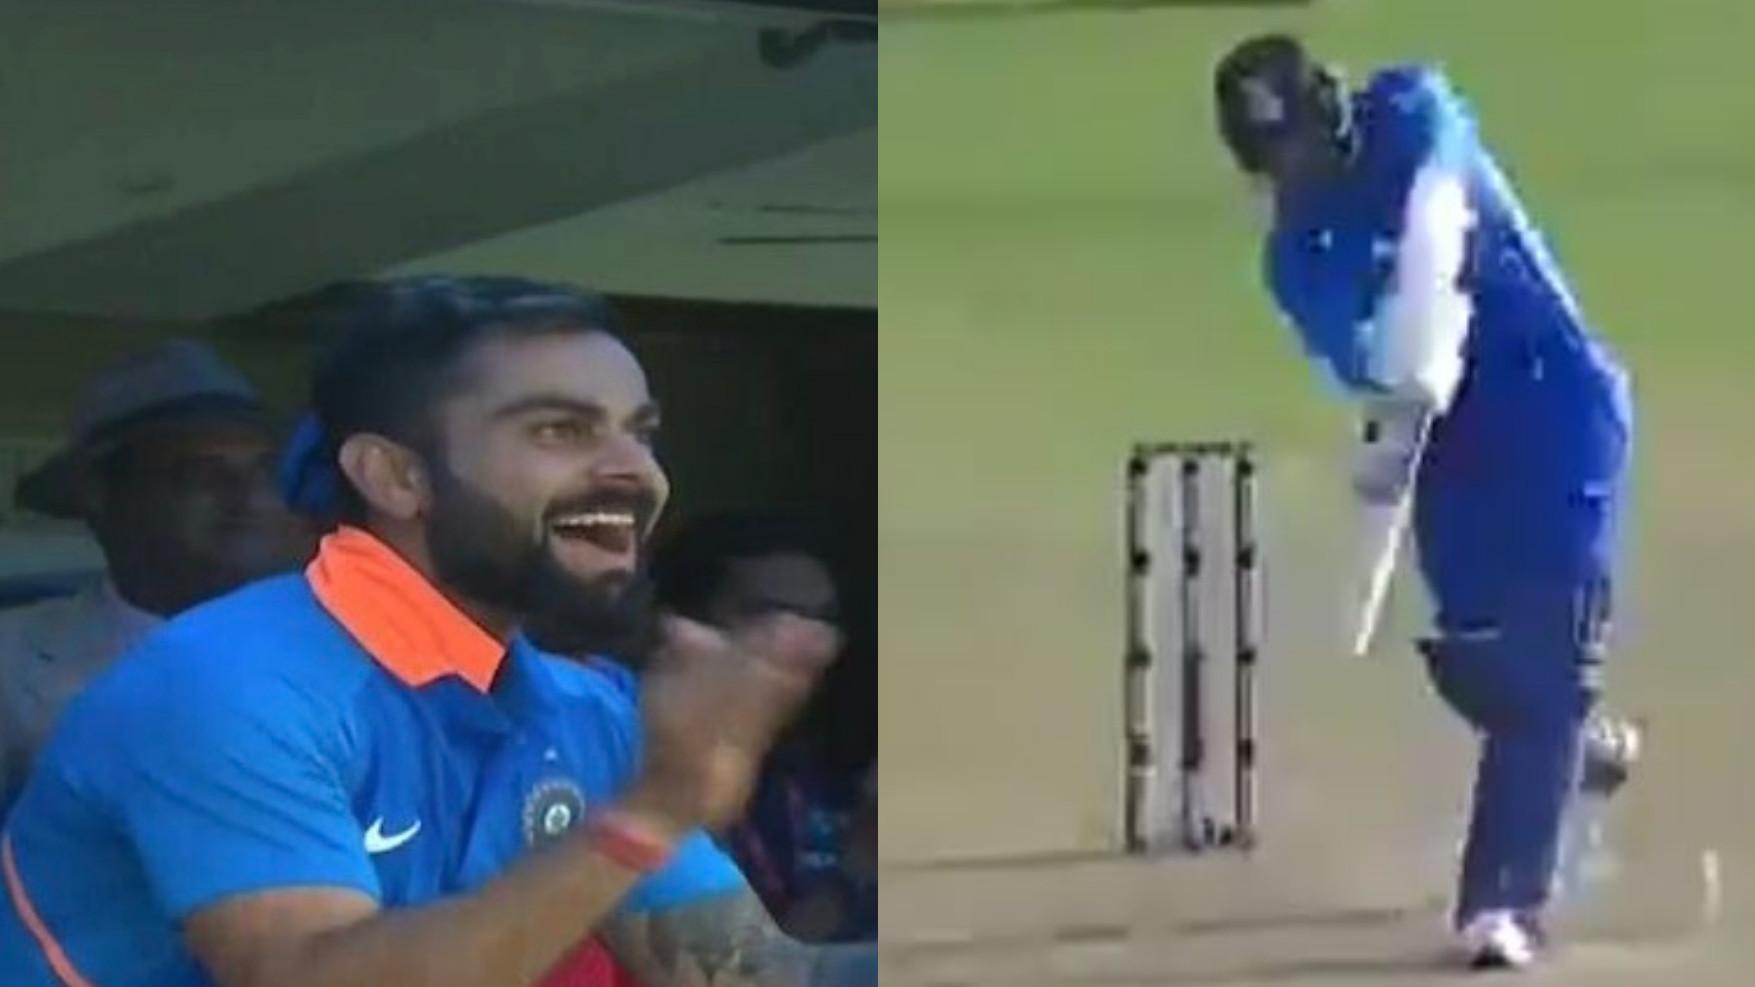 IND v AUS: WATCH- Jasprit Bumrah smacks a six off last ball of the innings; Virat Kohli admires the shot